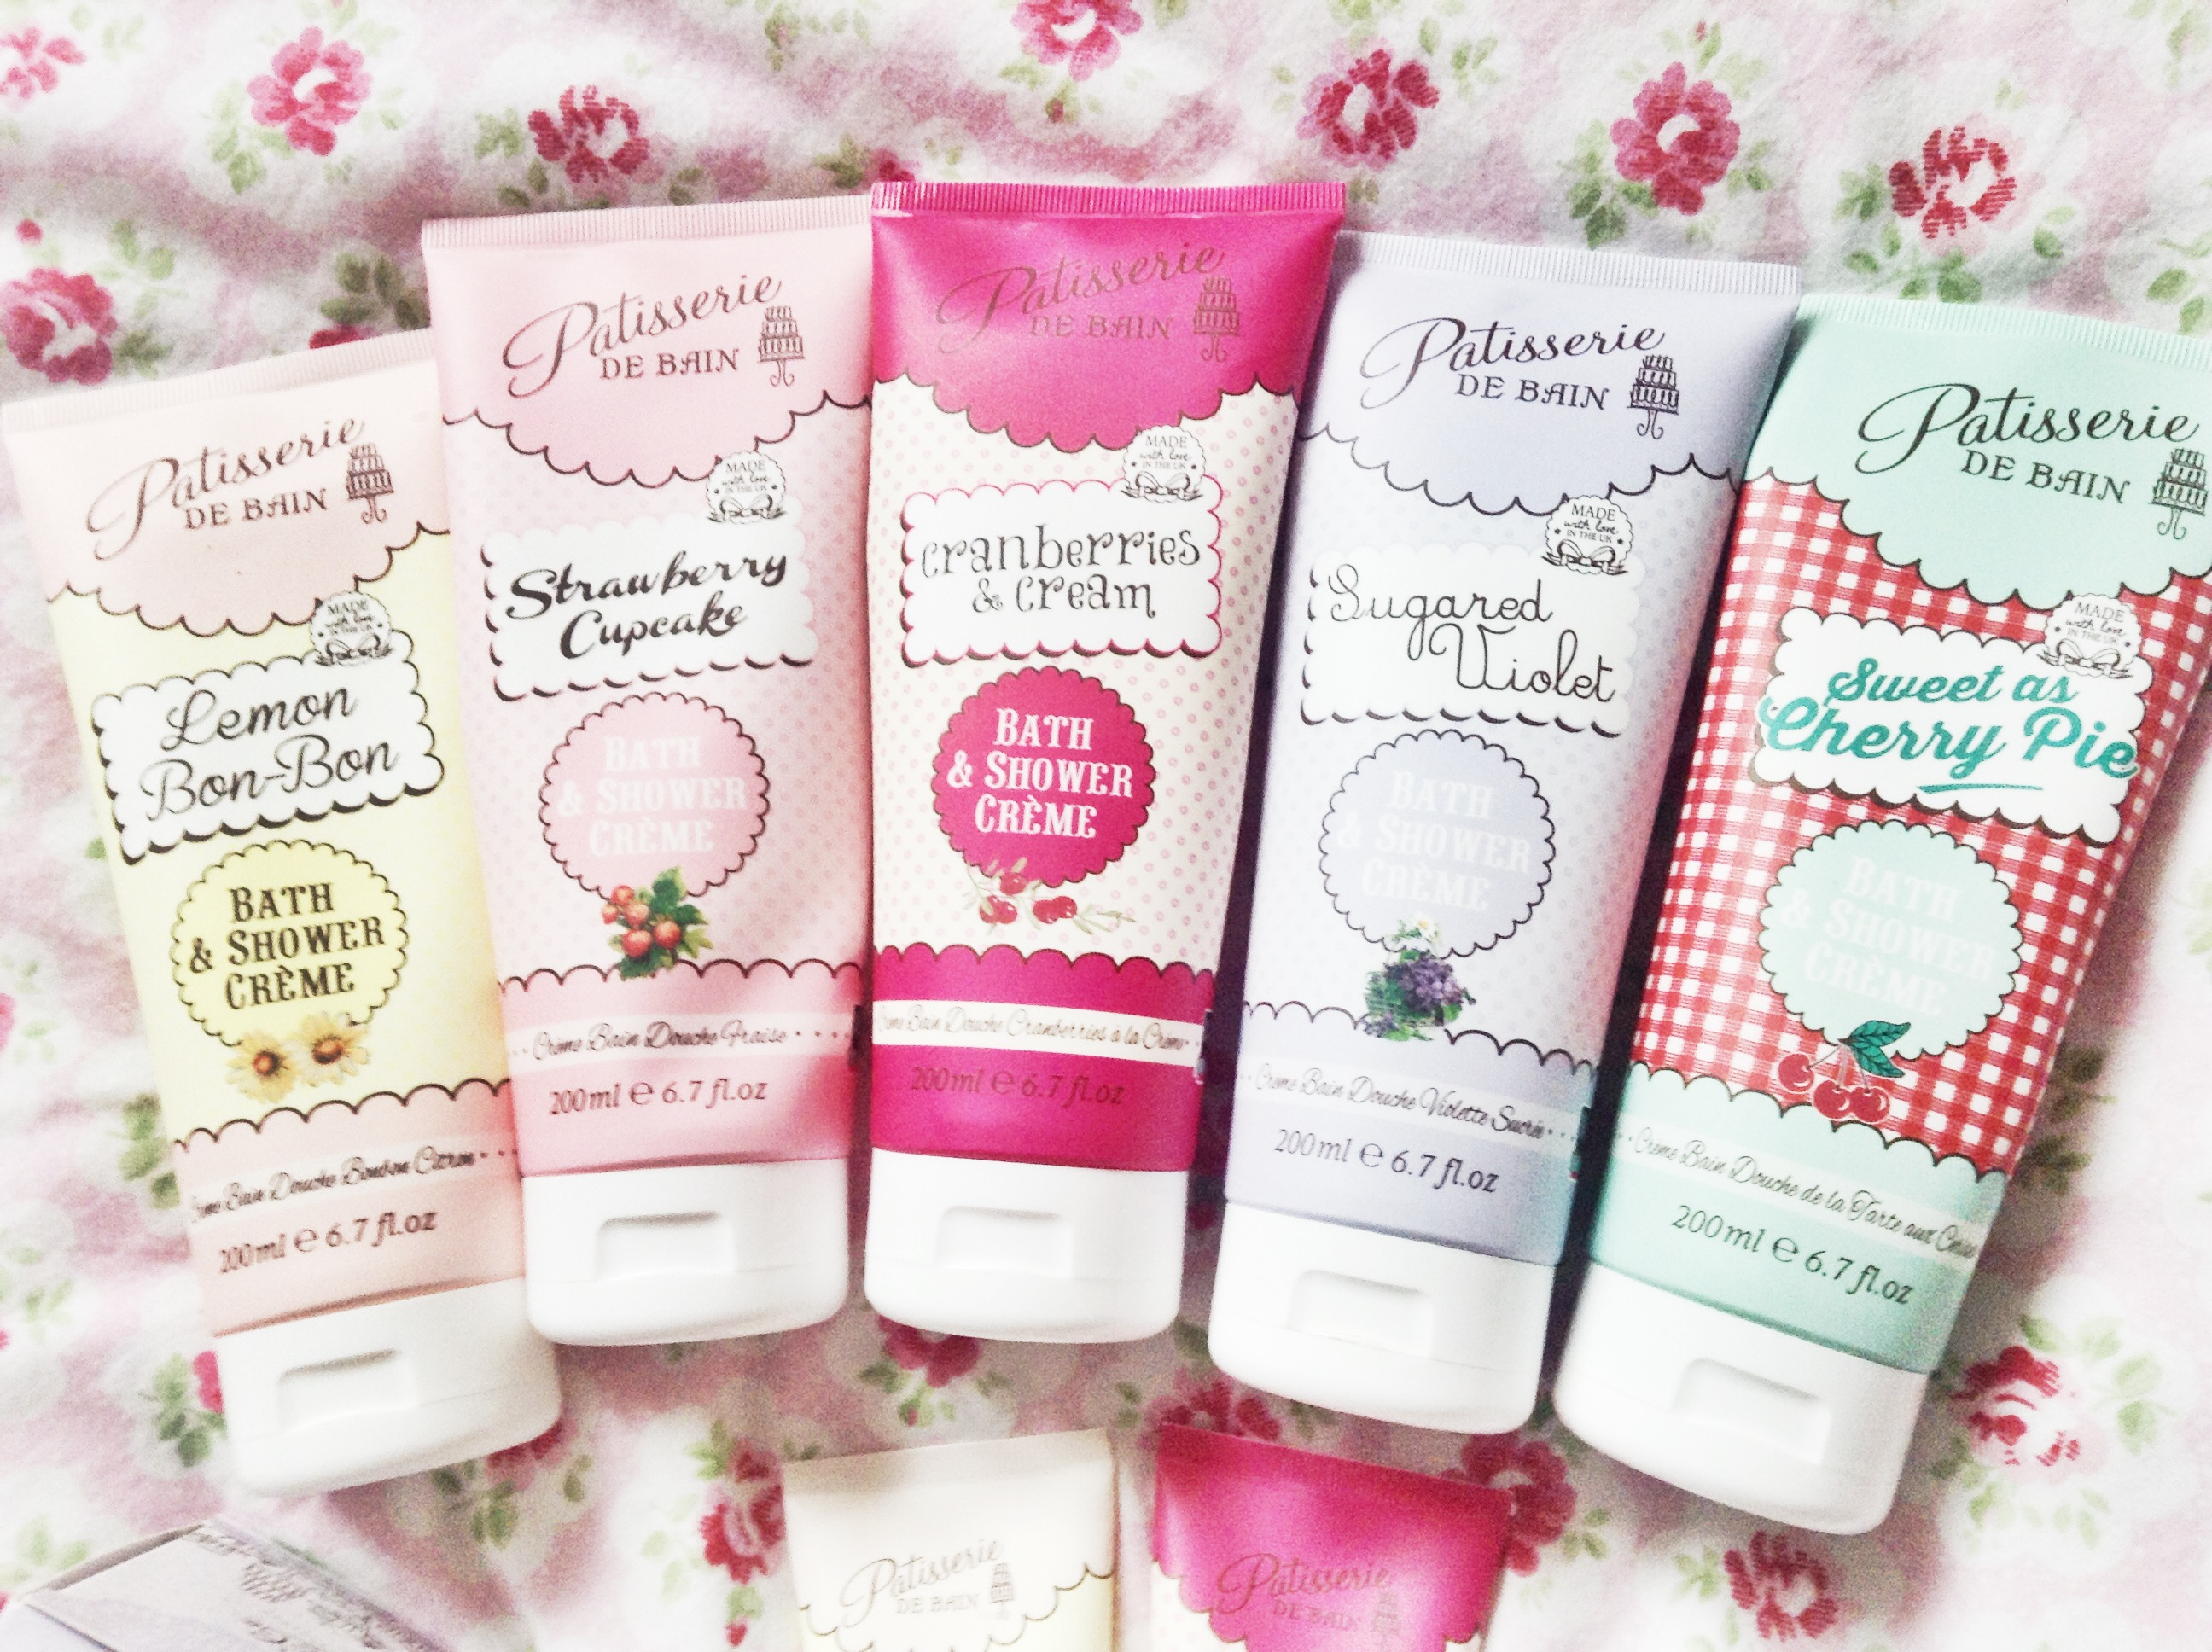 Patisserie De Bain Bath & Shower Cream Review - Really Ree